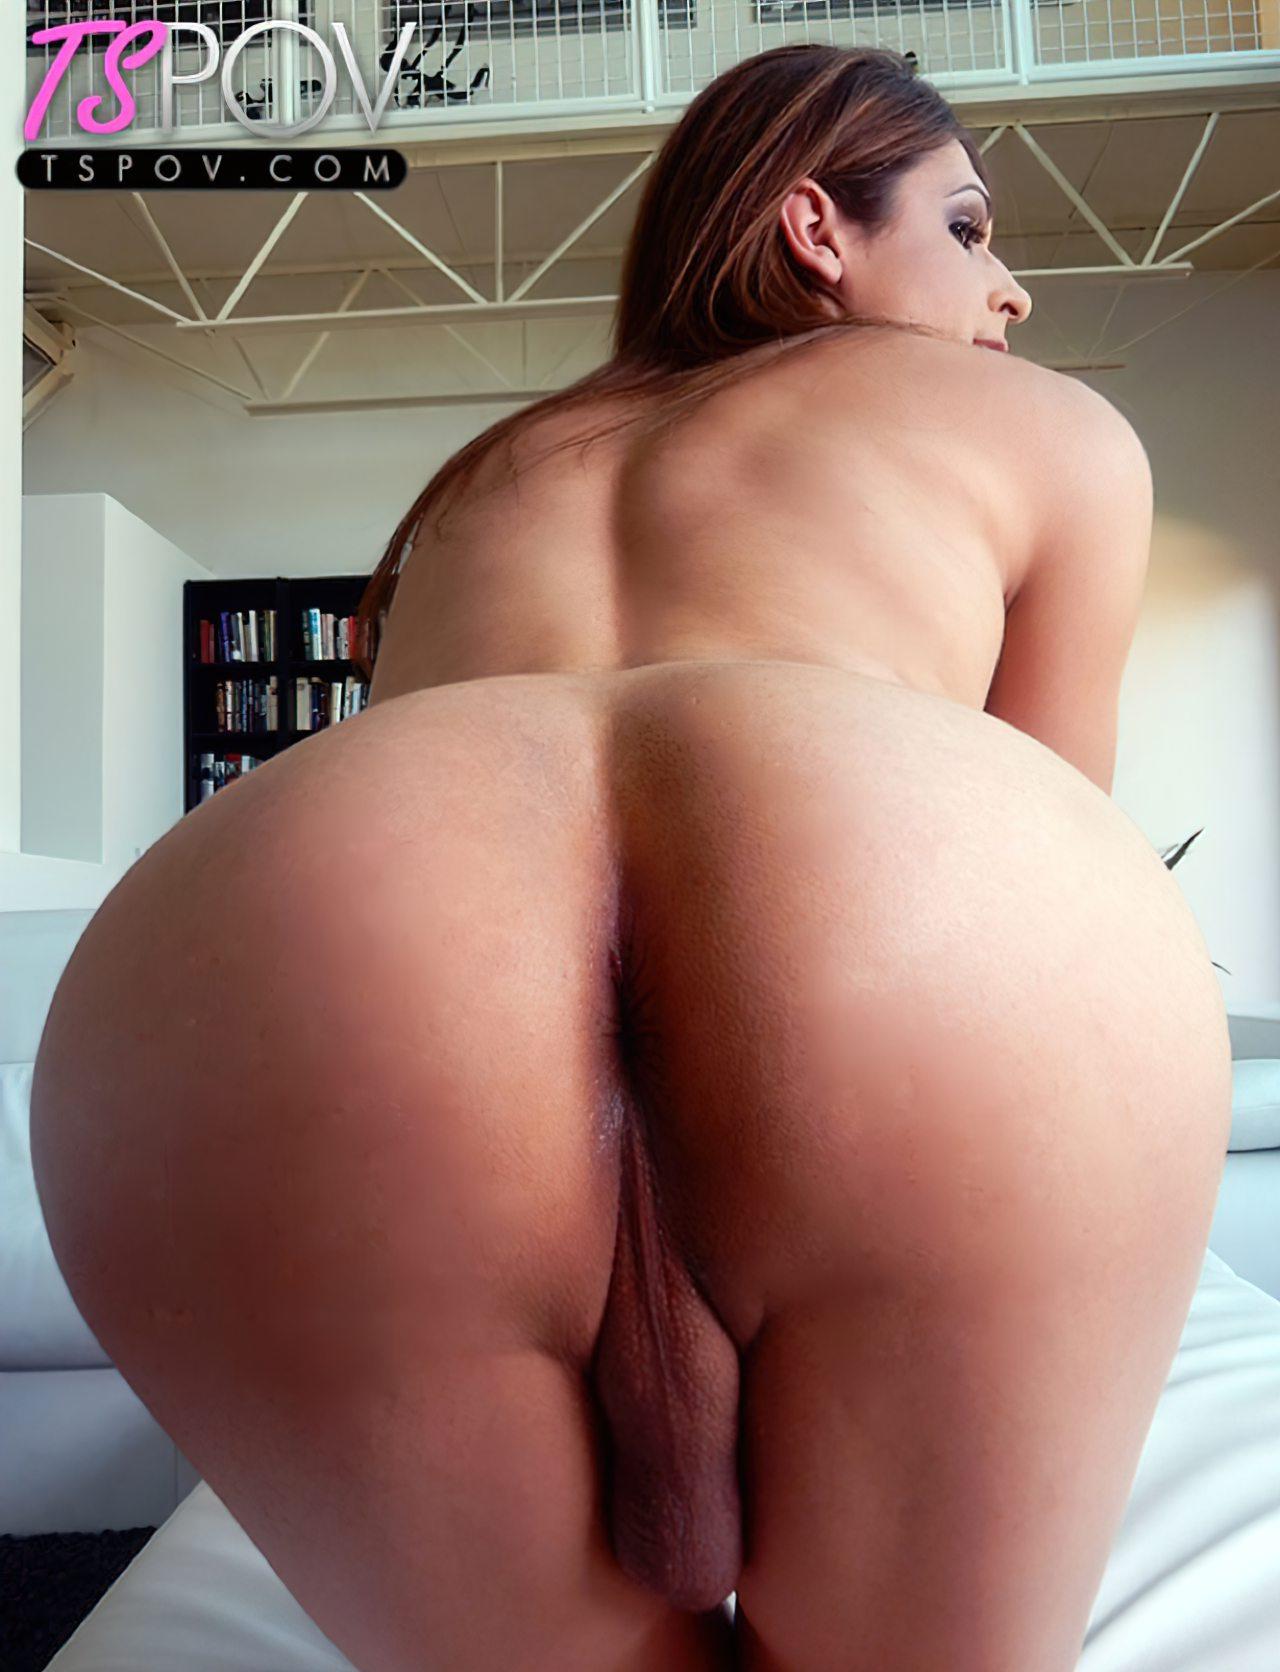 Travestis Nudes (57)